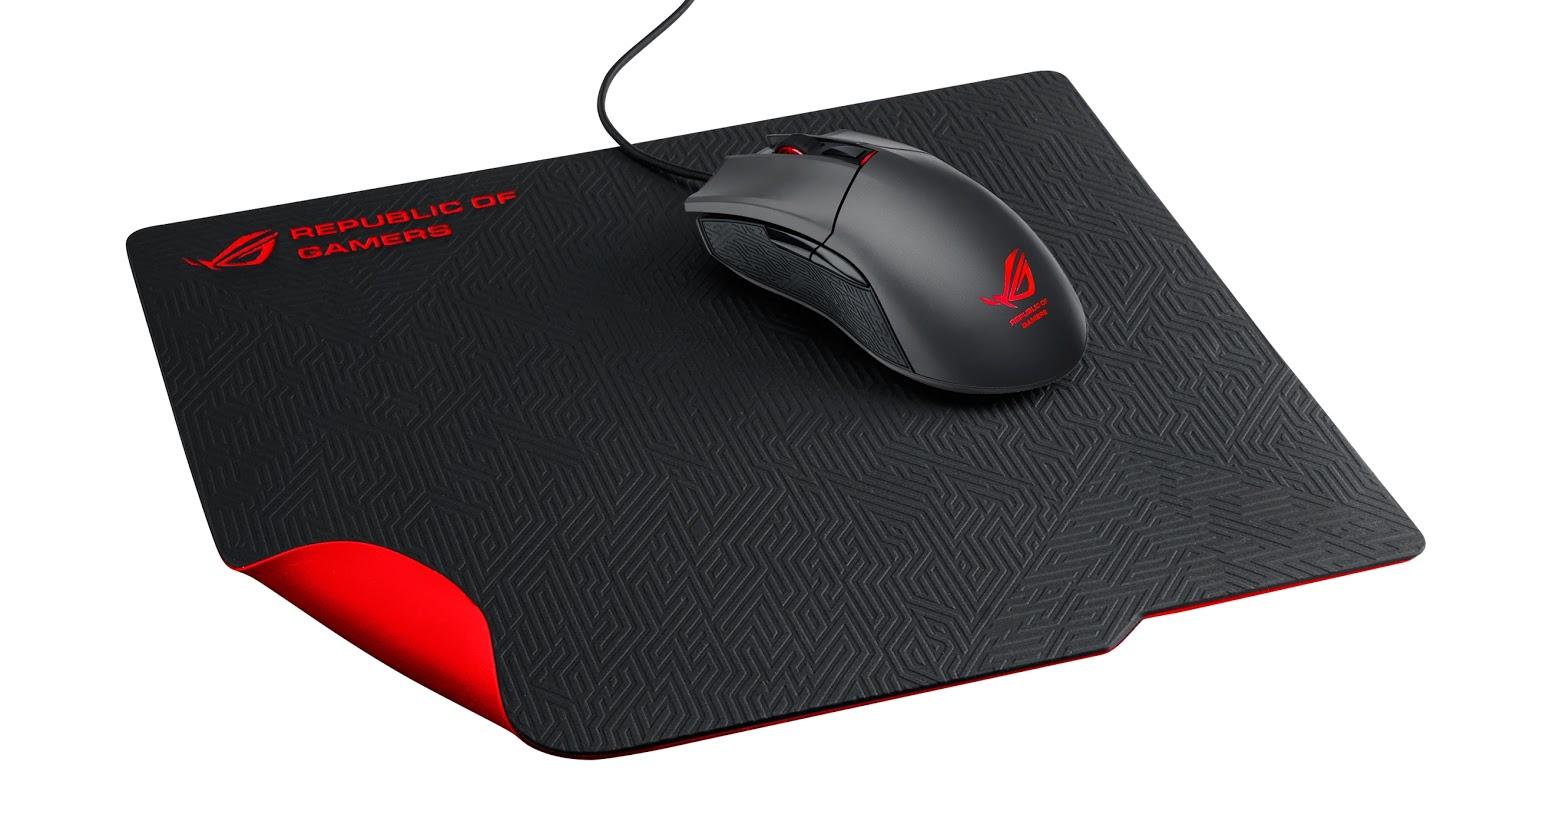 ROG_Wheststone_Gaming_Mousepad_2